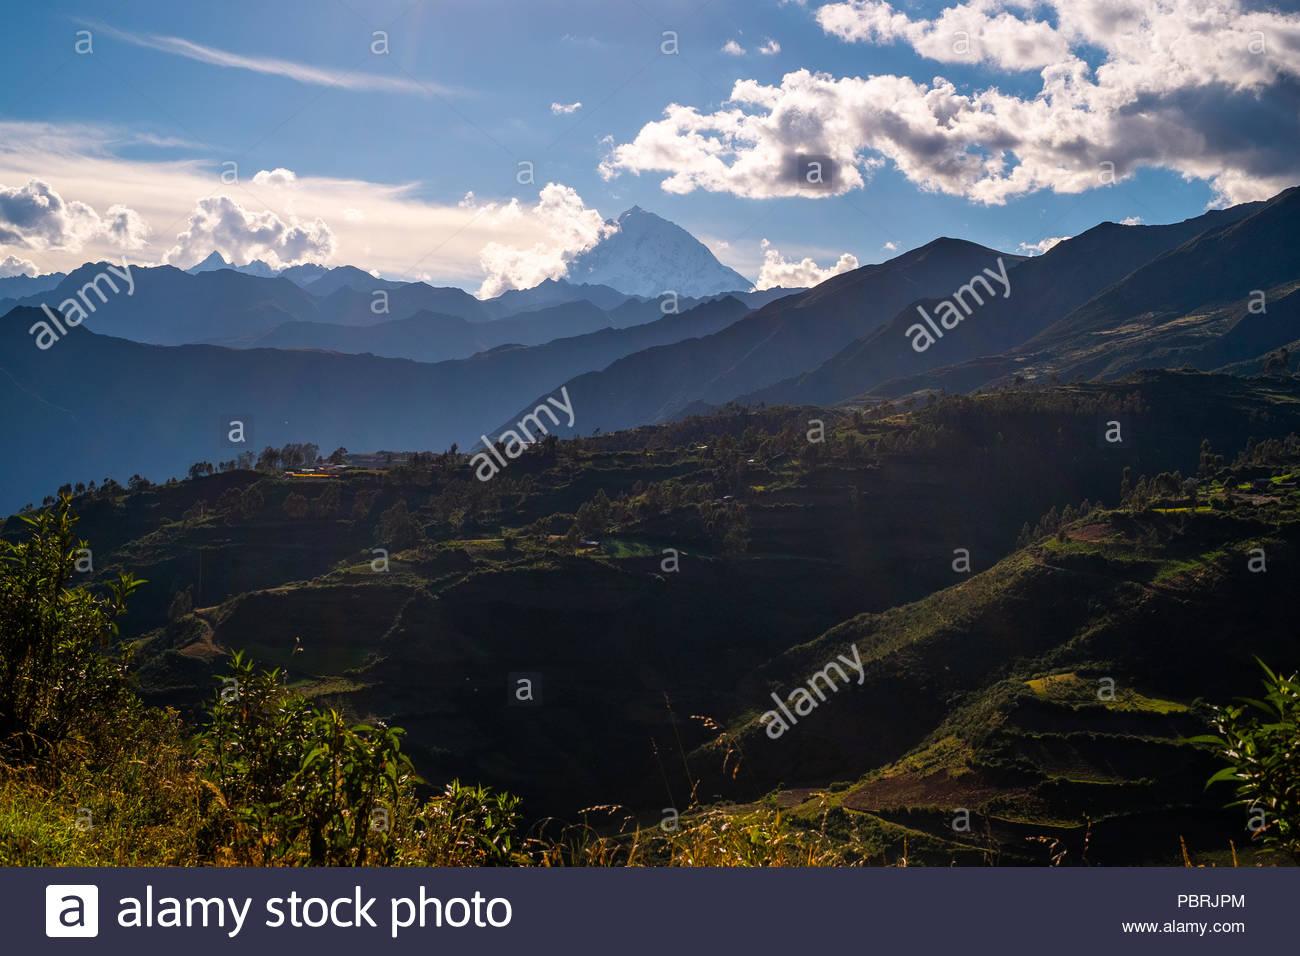 View of Salkantay Mountain, Peru - Stock Image